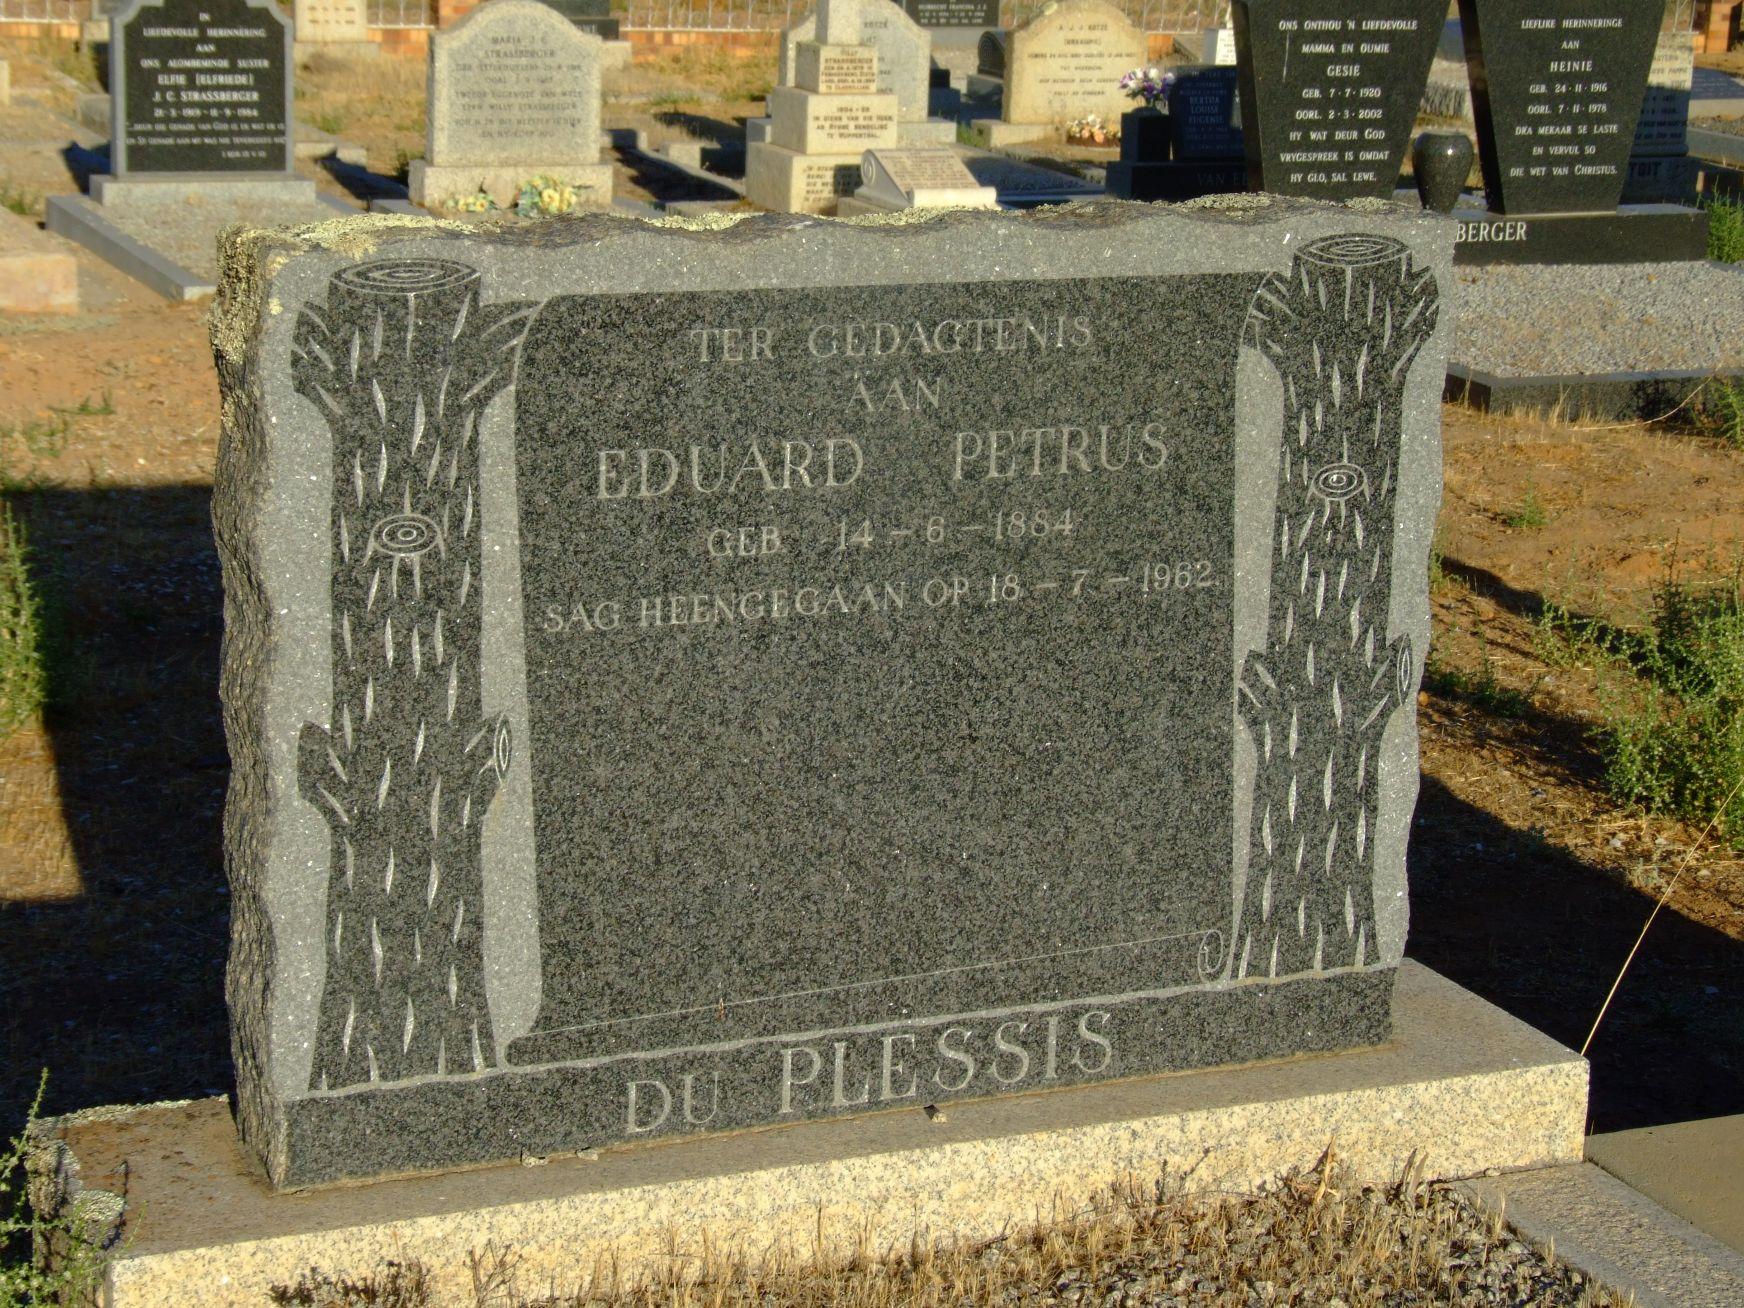 Du Plessis, Eduard Petrus